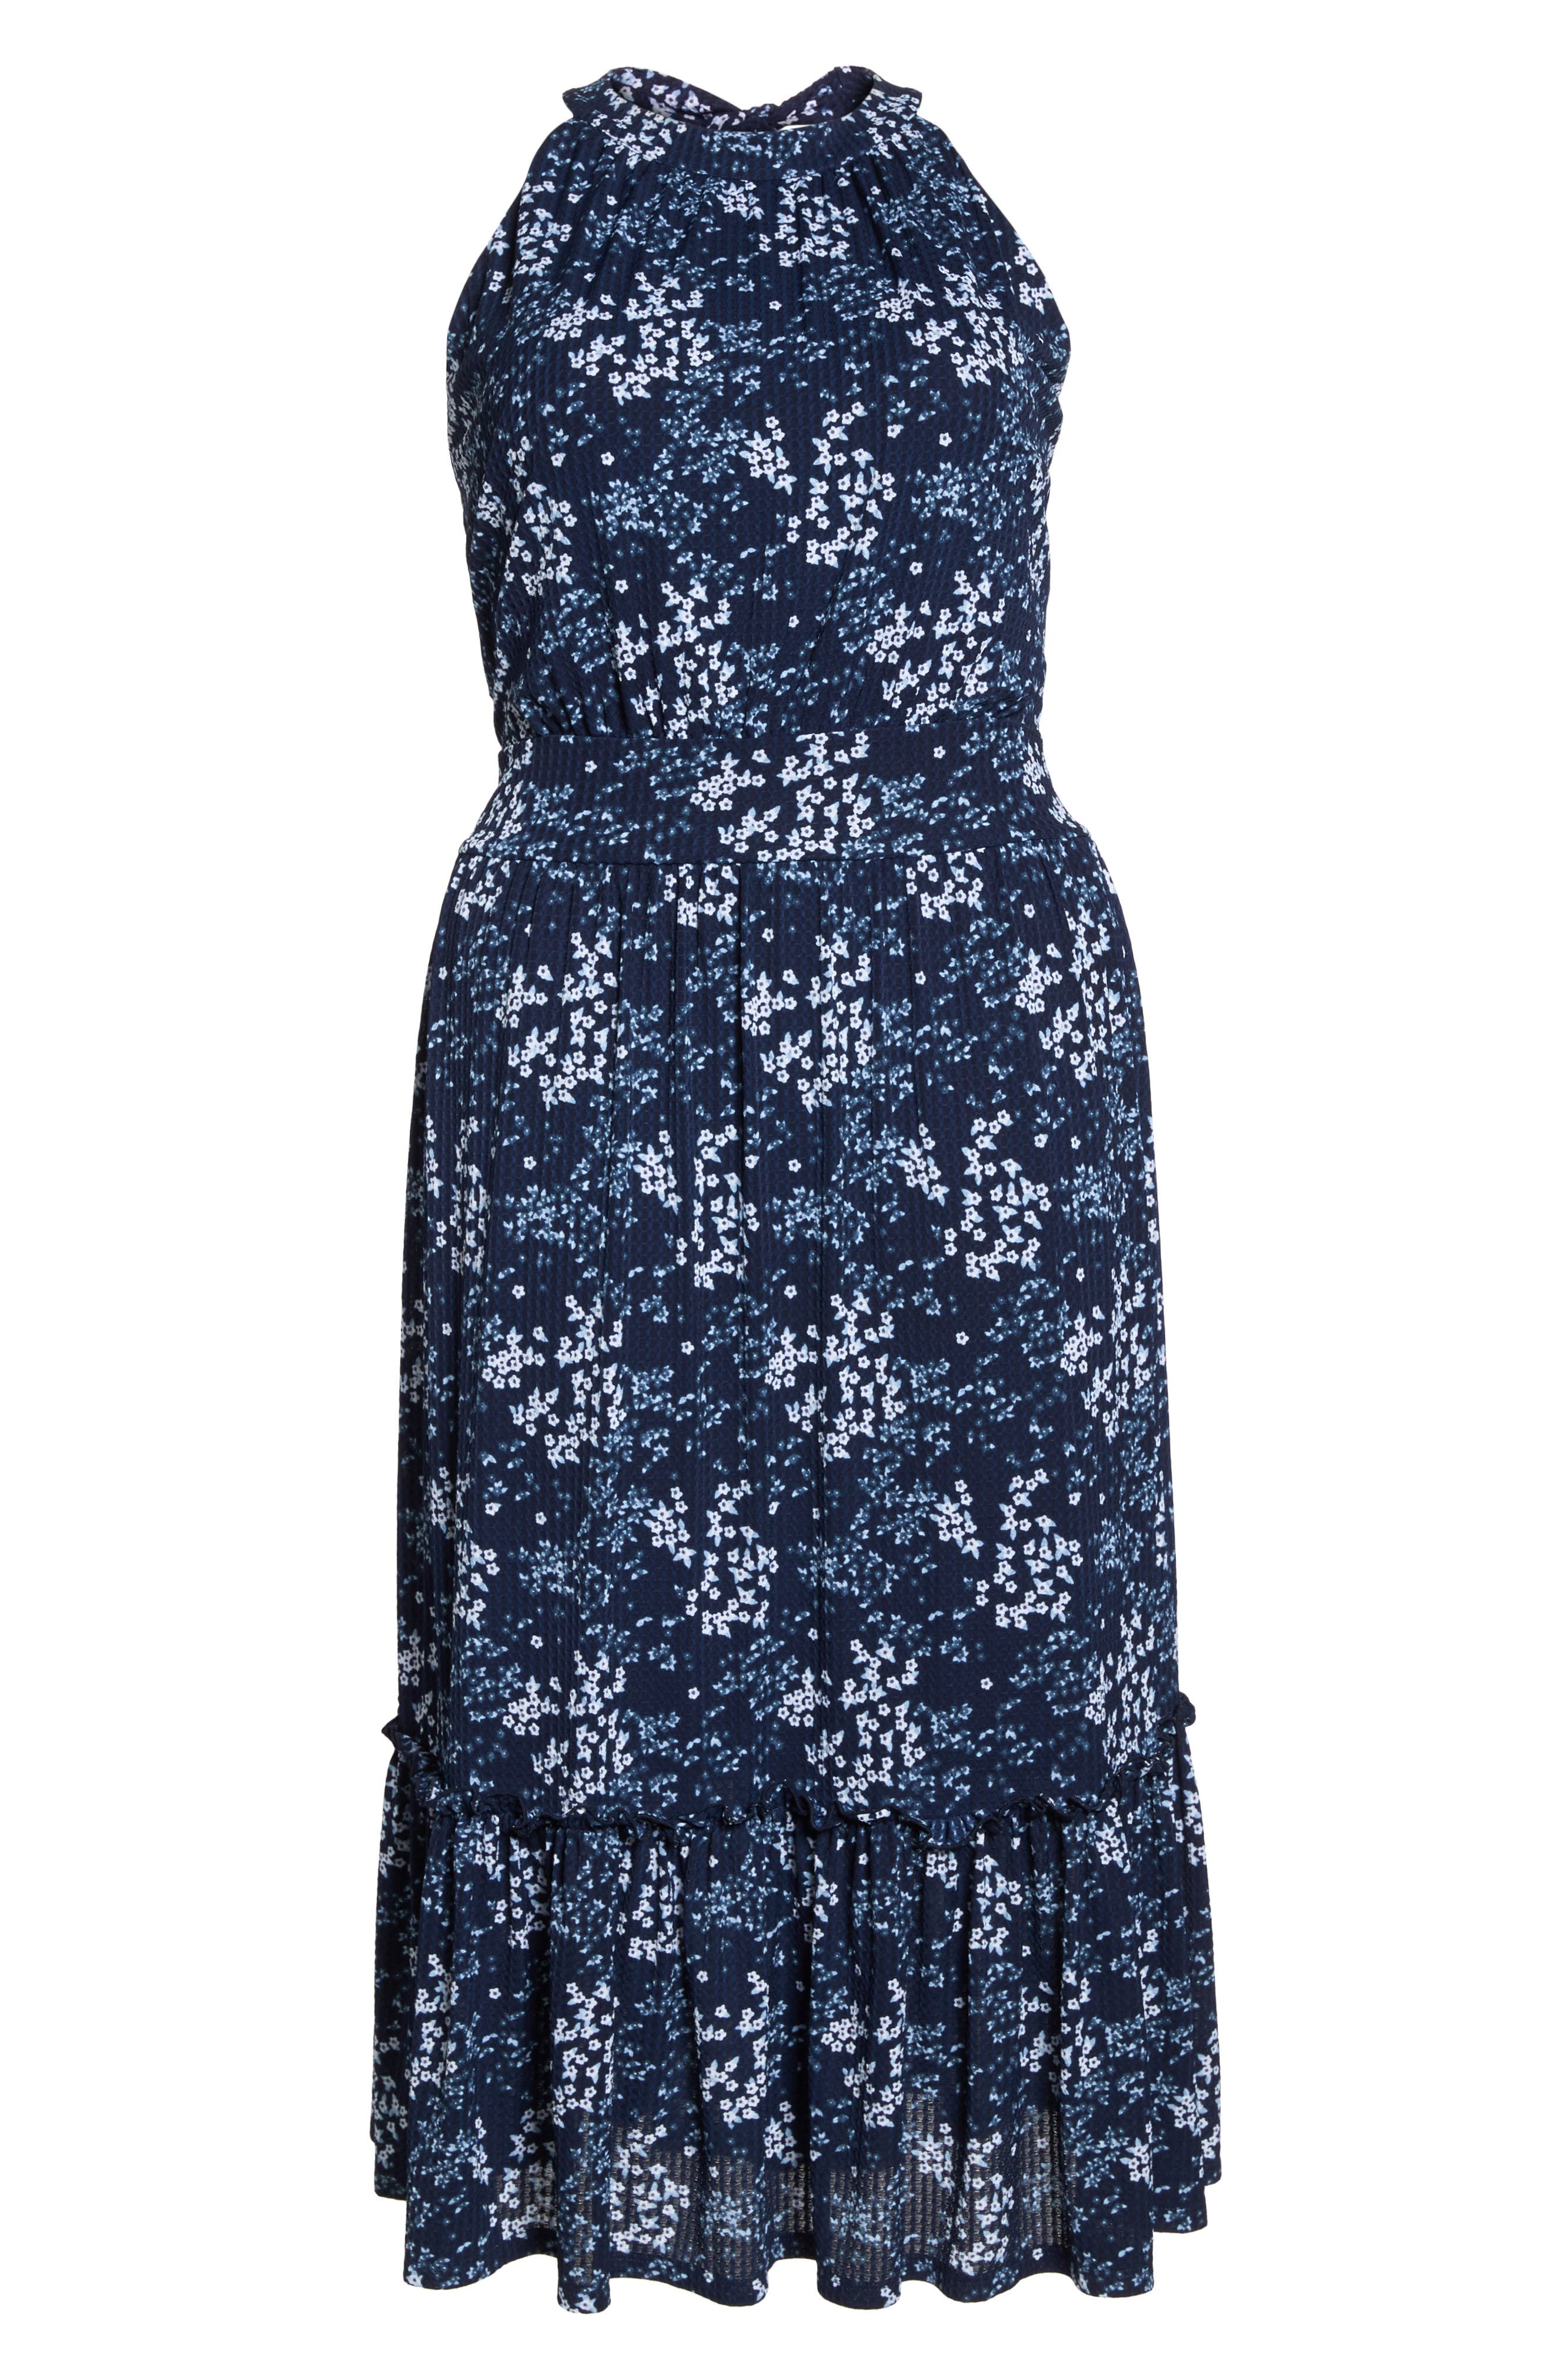 Floral Tiered Midi Halter Dress,                             Alternate thumbnail 7, color,                             True Navy/ Light Chambray